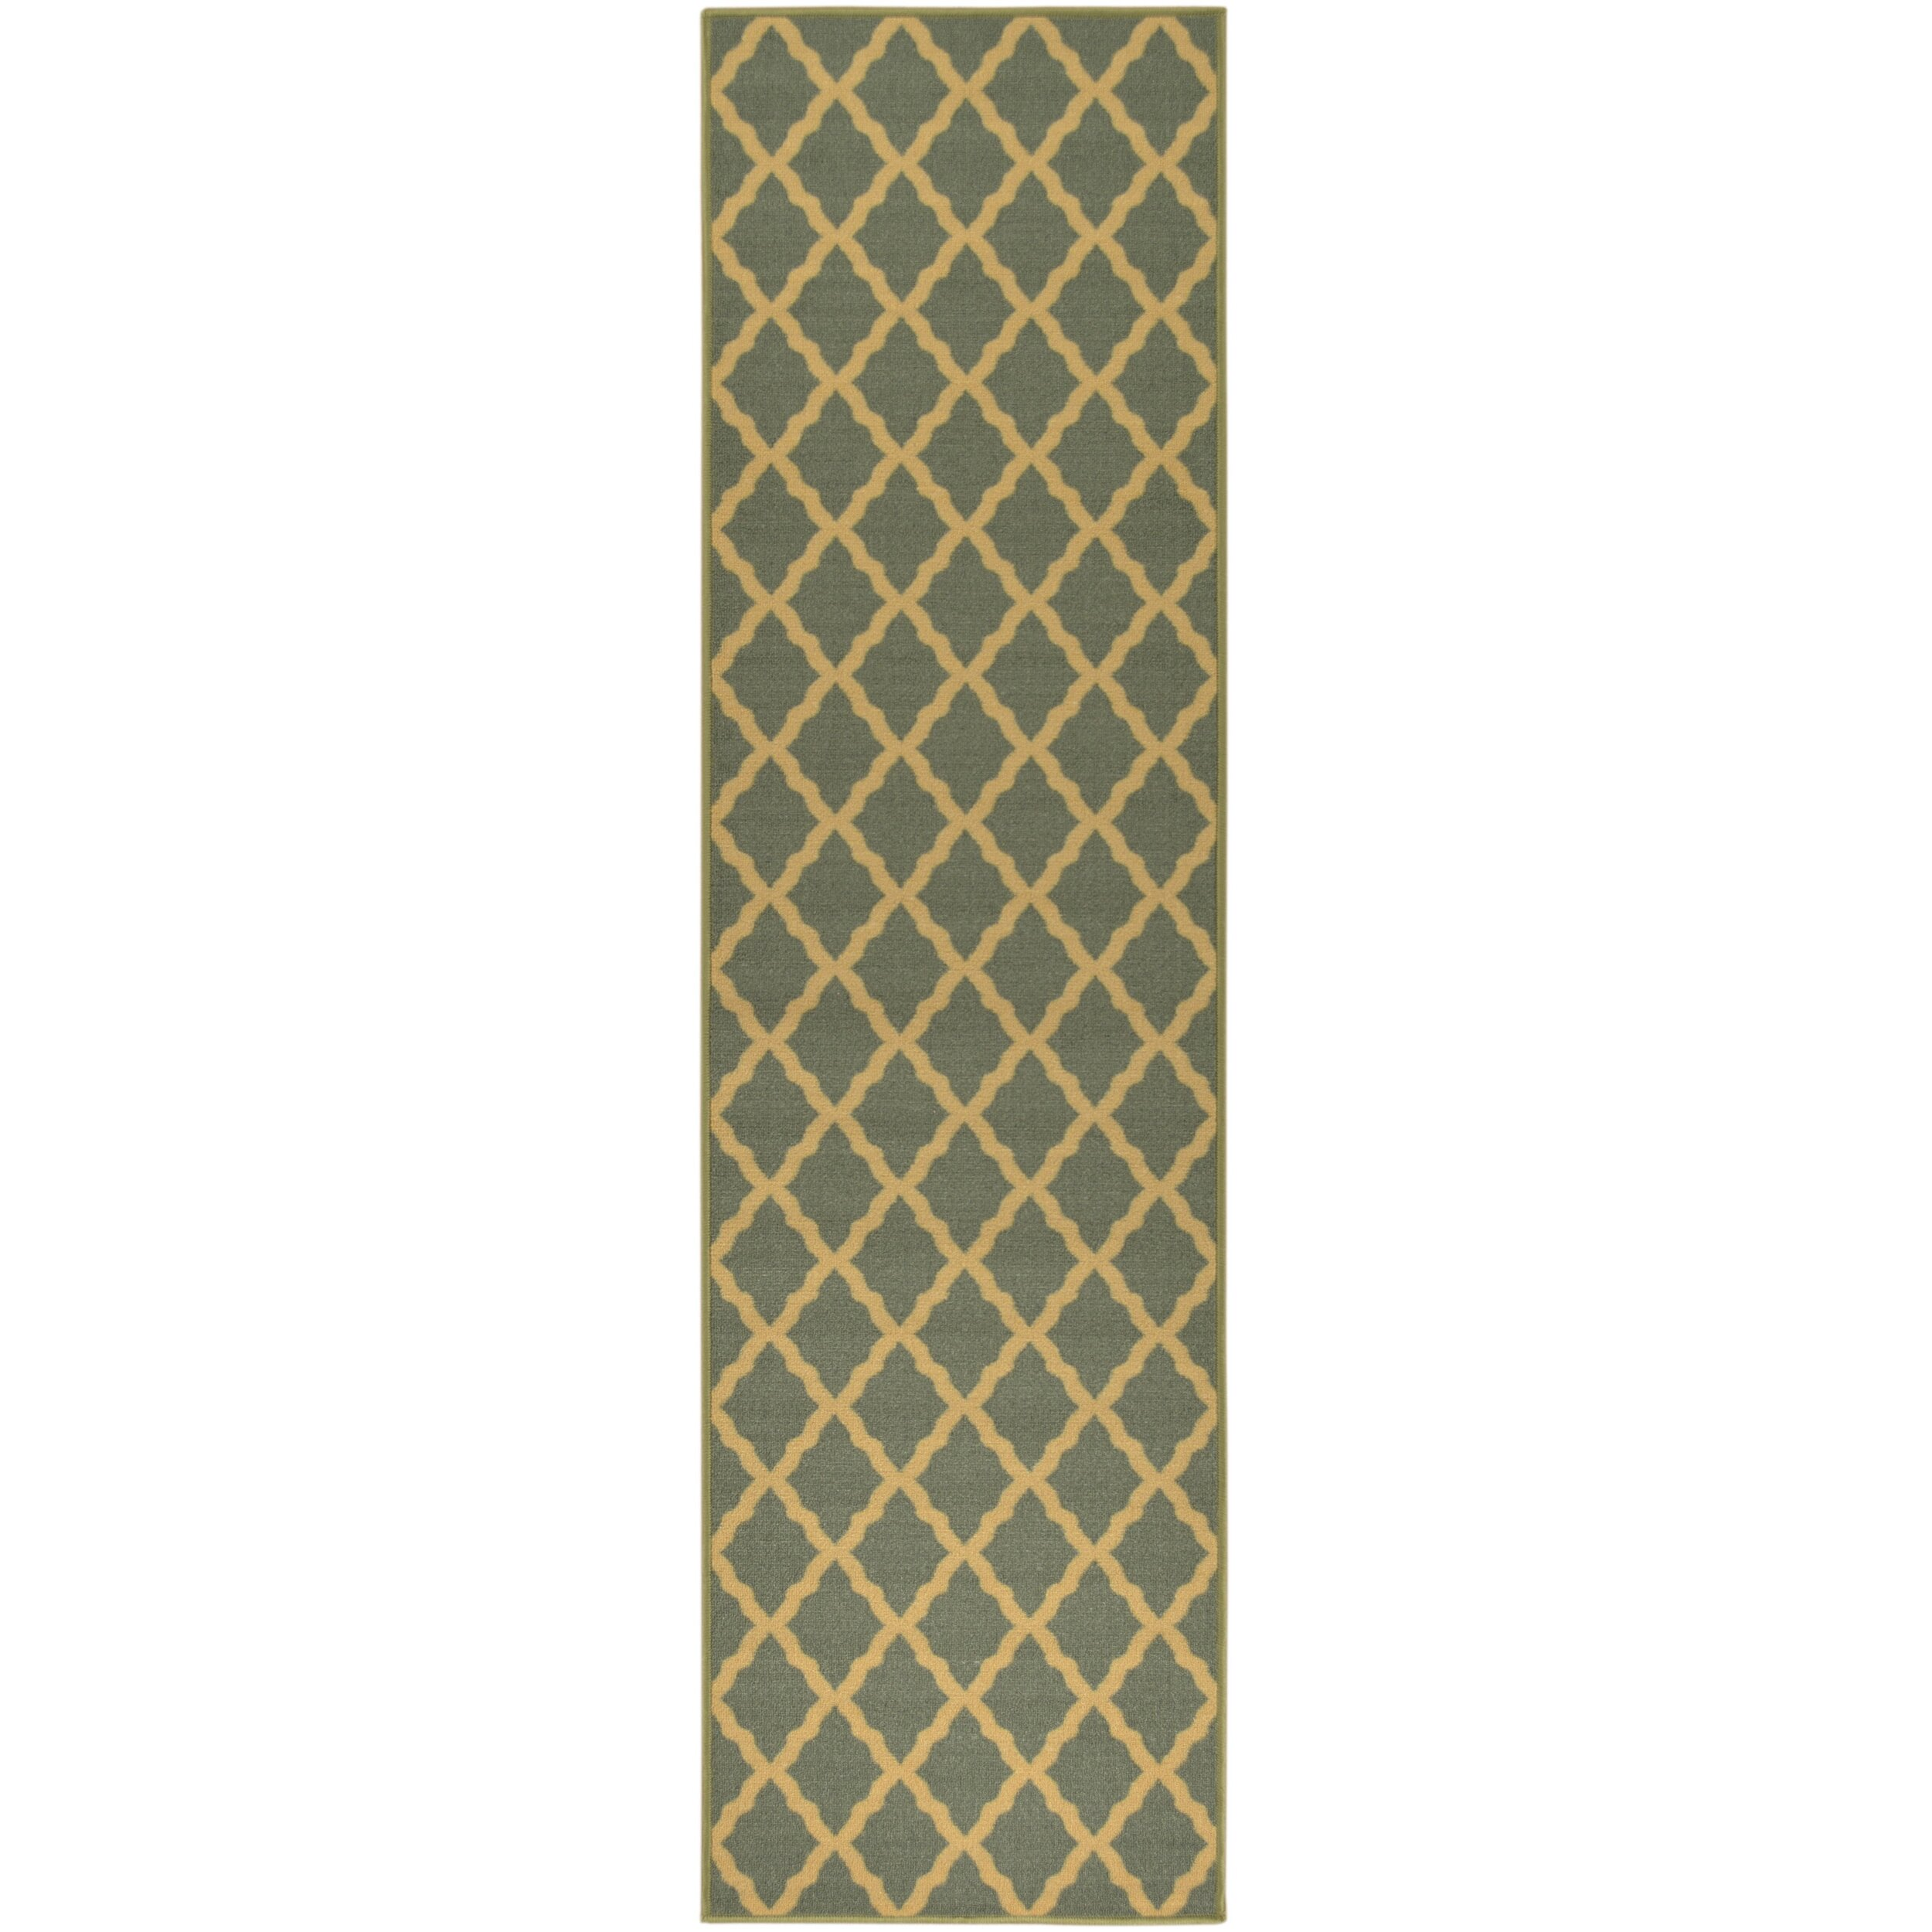 ottomanson ottohome moroccan trellis design sage green area rug reviews wayfair. Black Bedroom Furniture Sets. Home Design Ideas